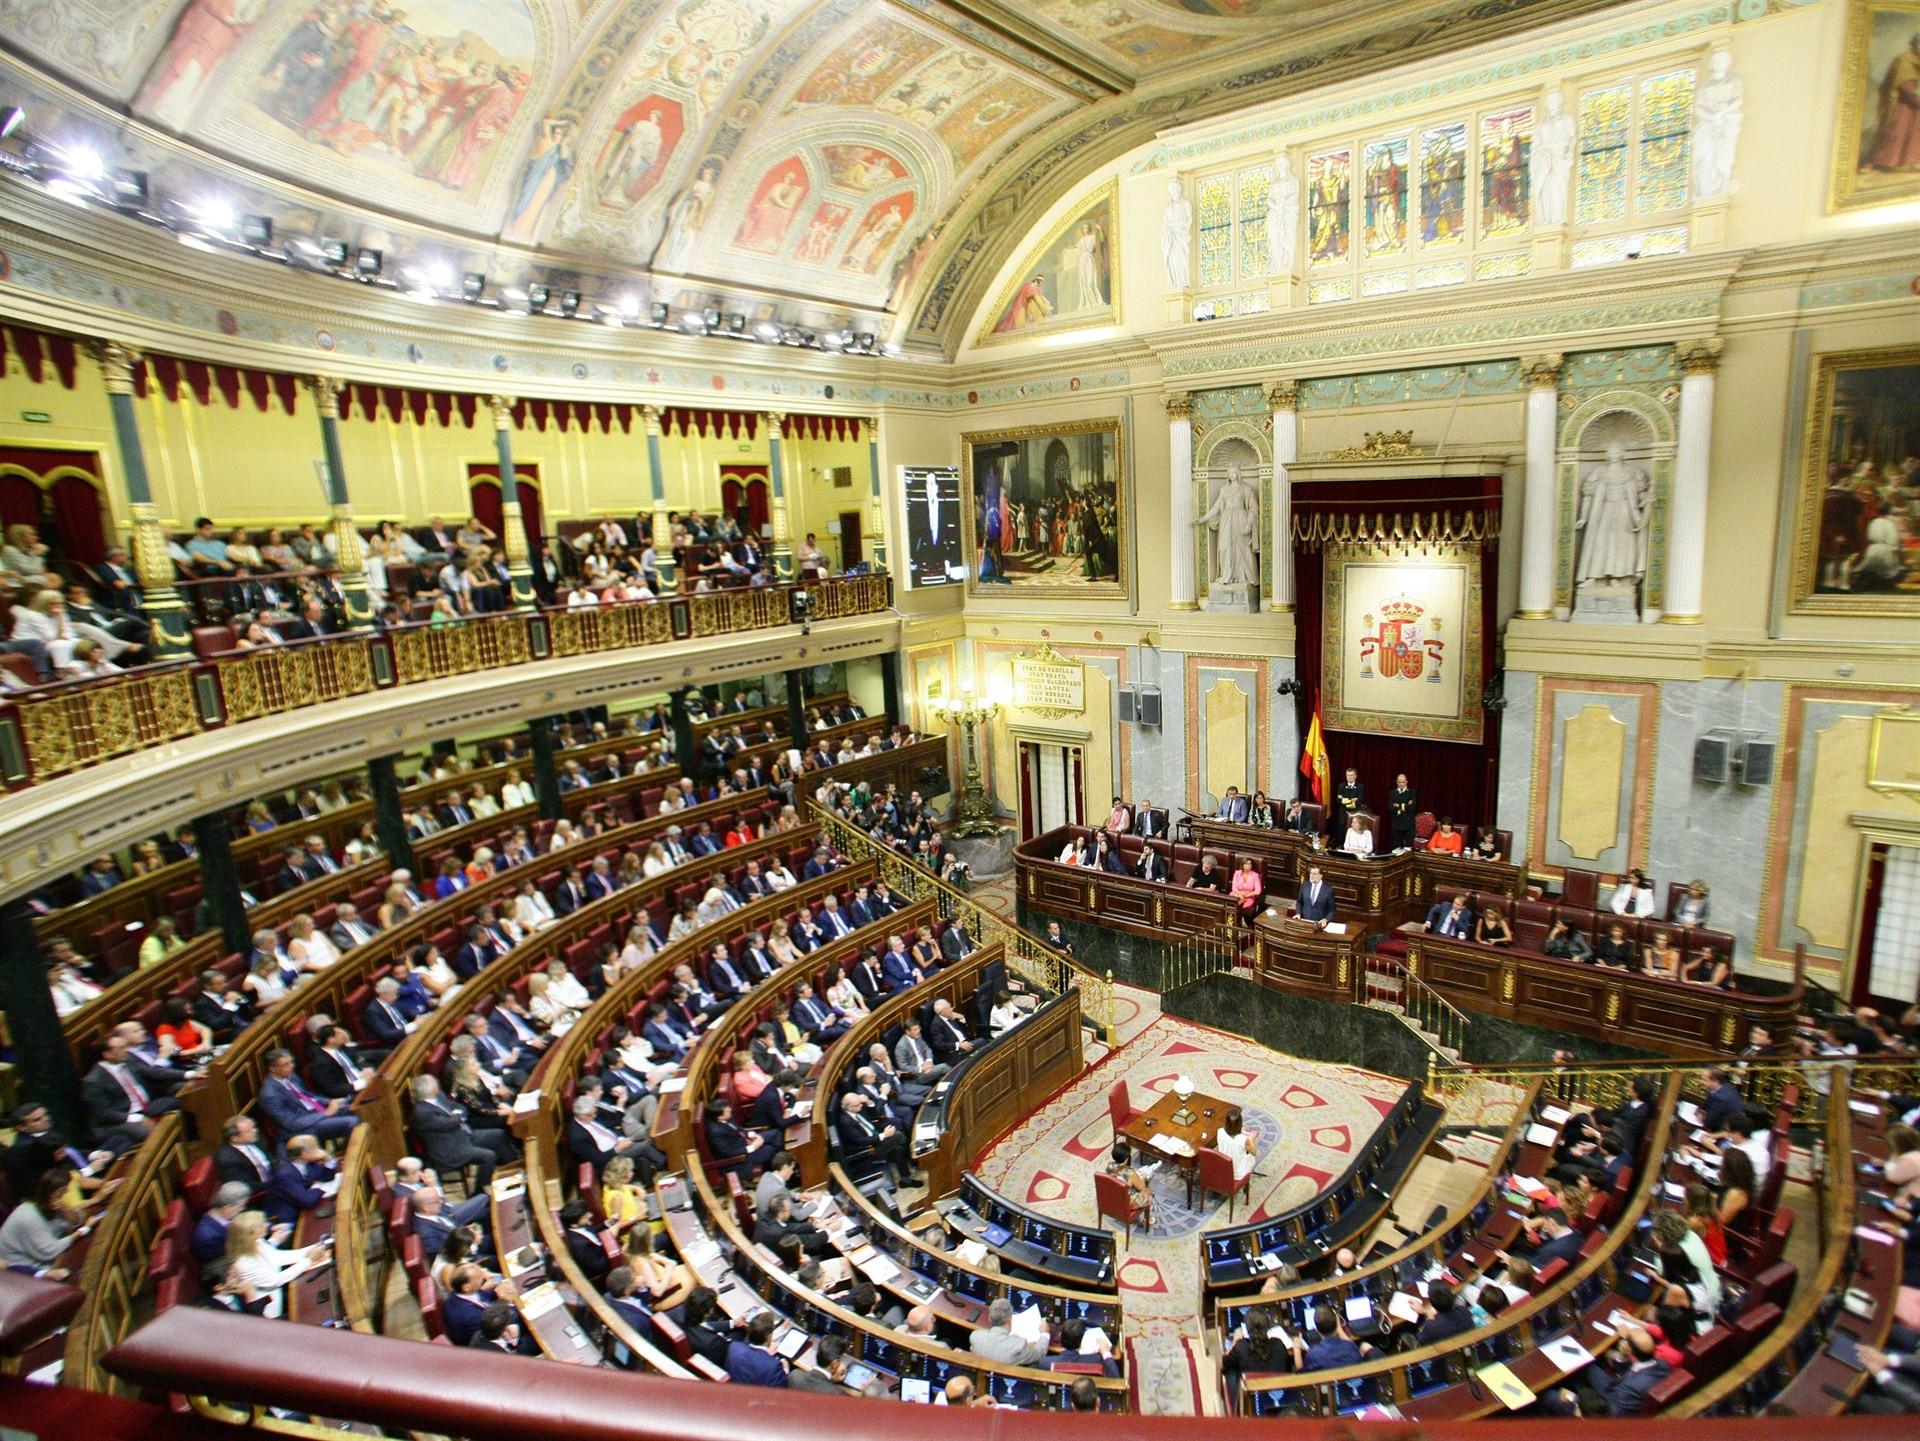 Congresovotaciondecretoleyestiba